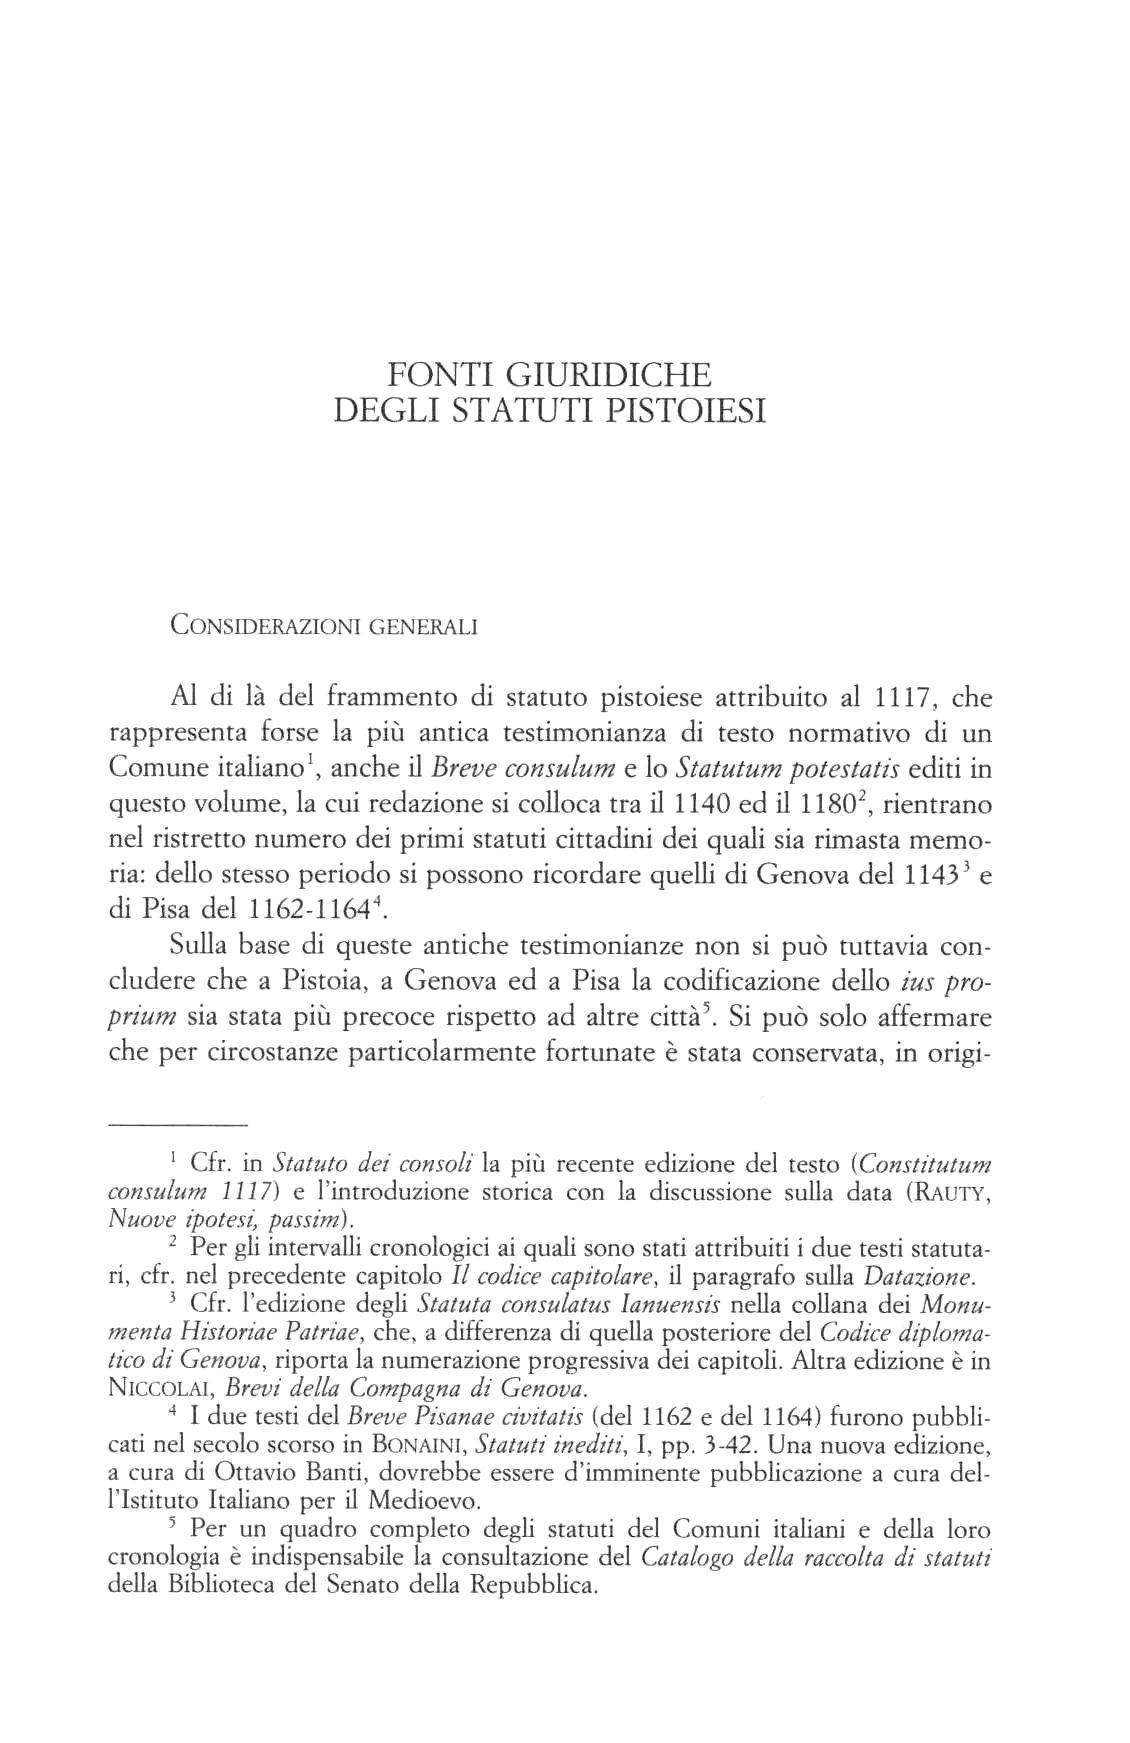 statuti pistoiesi del sec.XII 0043.jpg